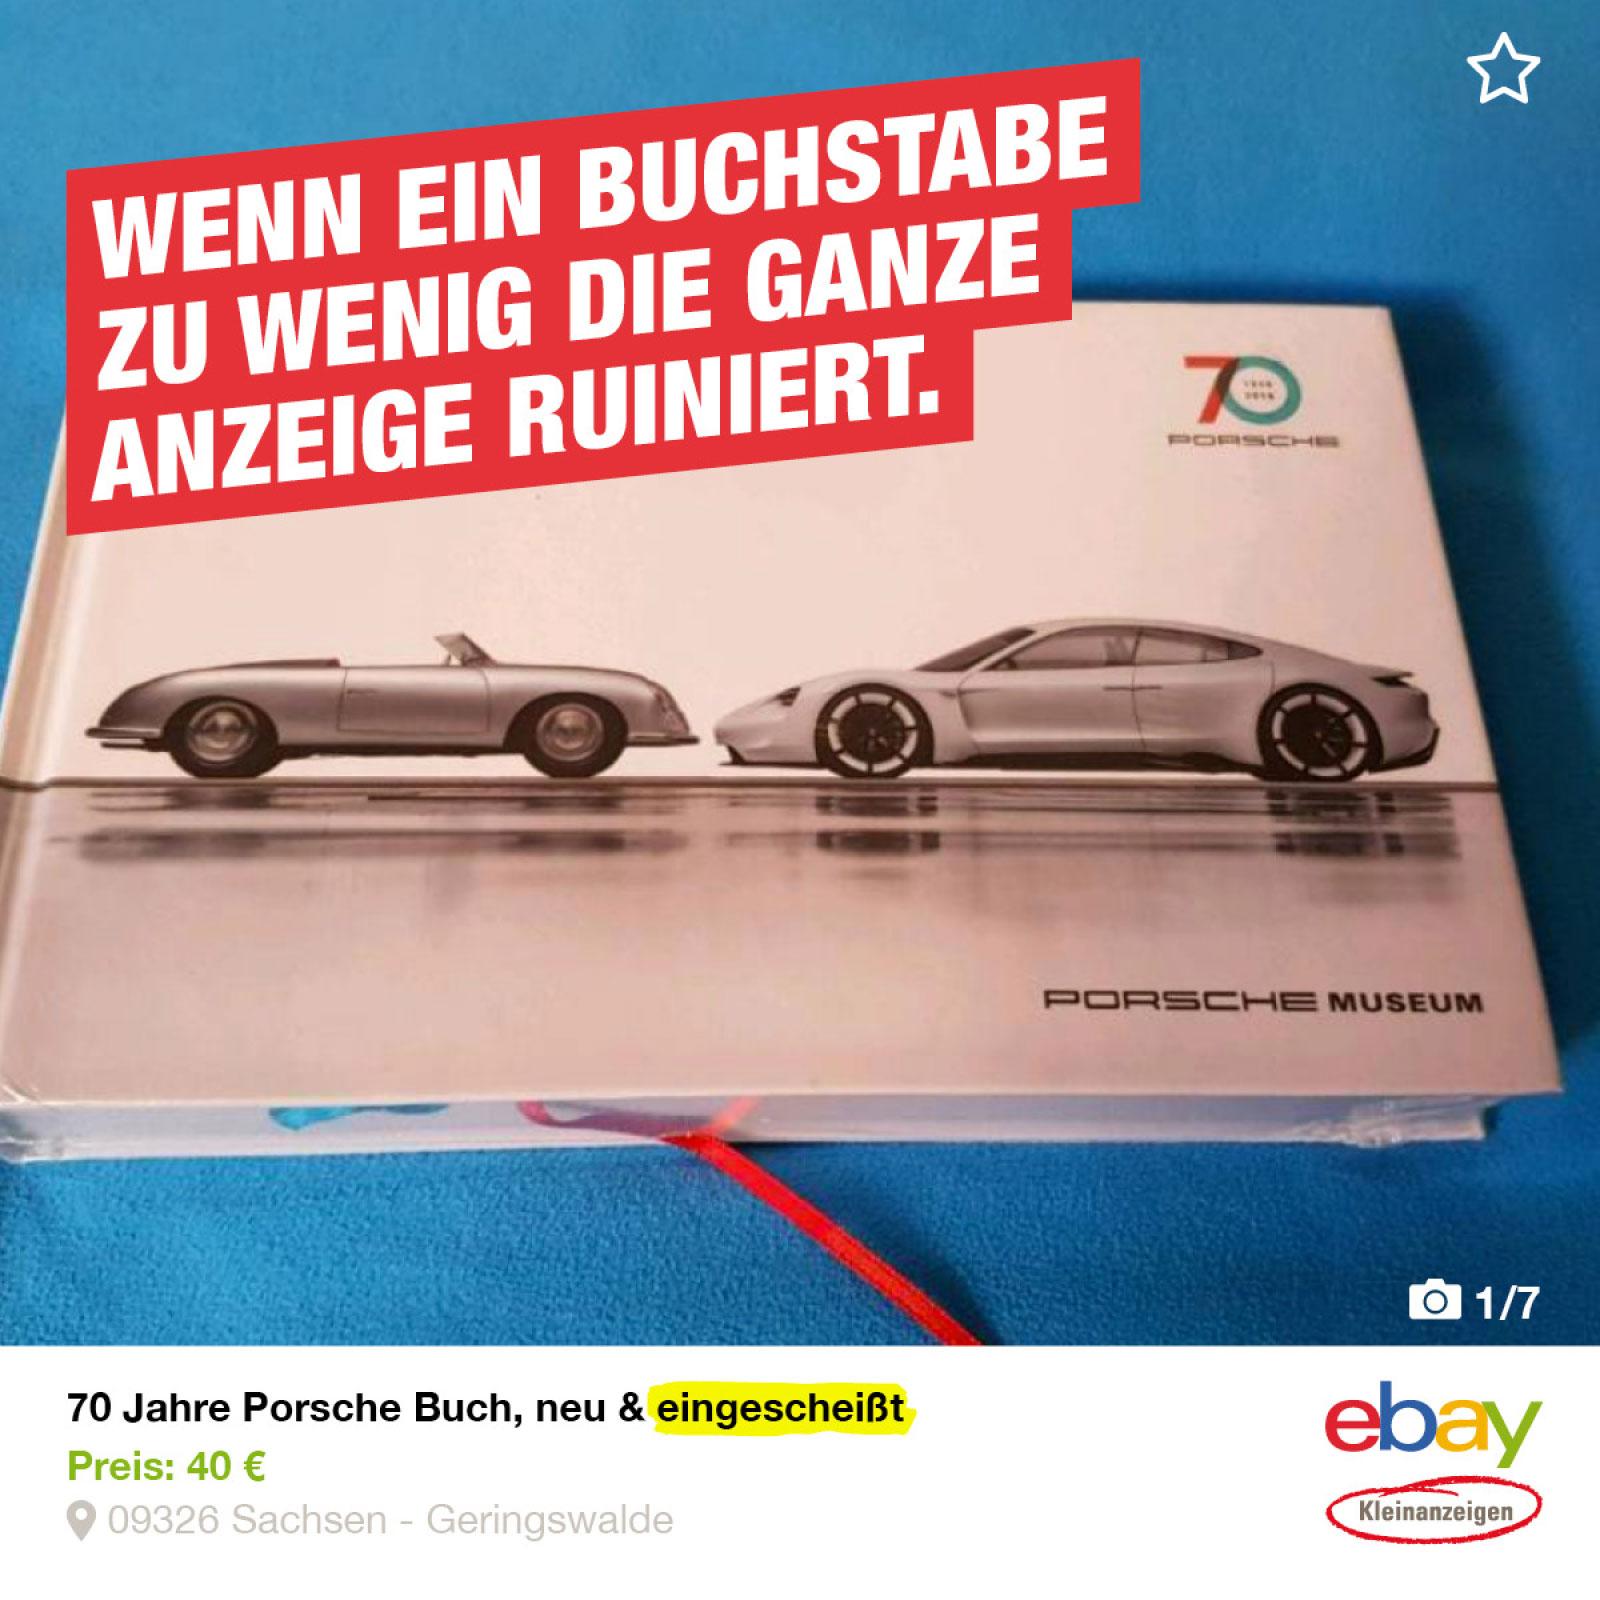 ebay_postings_14x14_rz_81